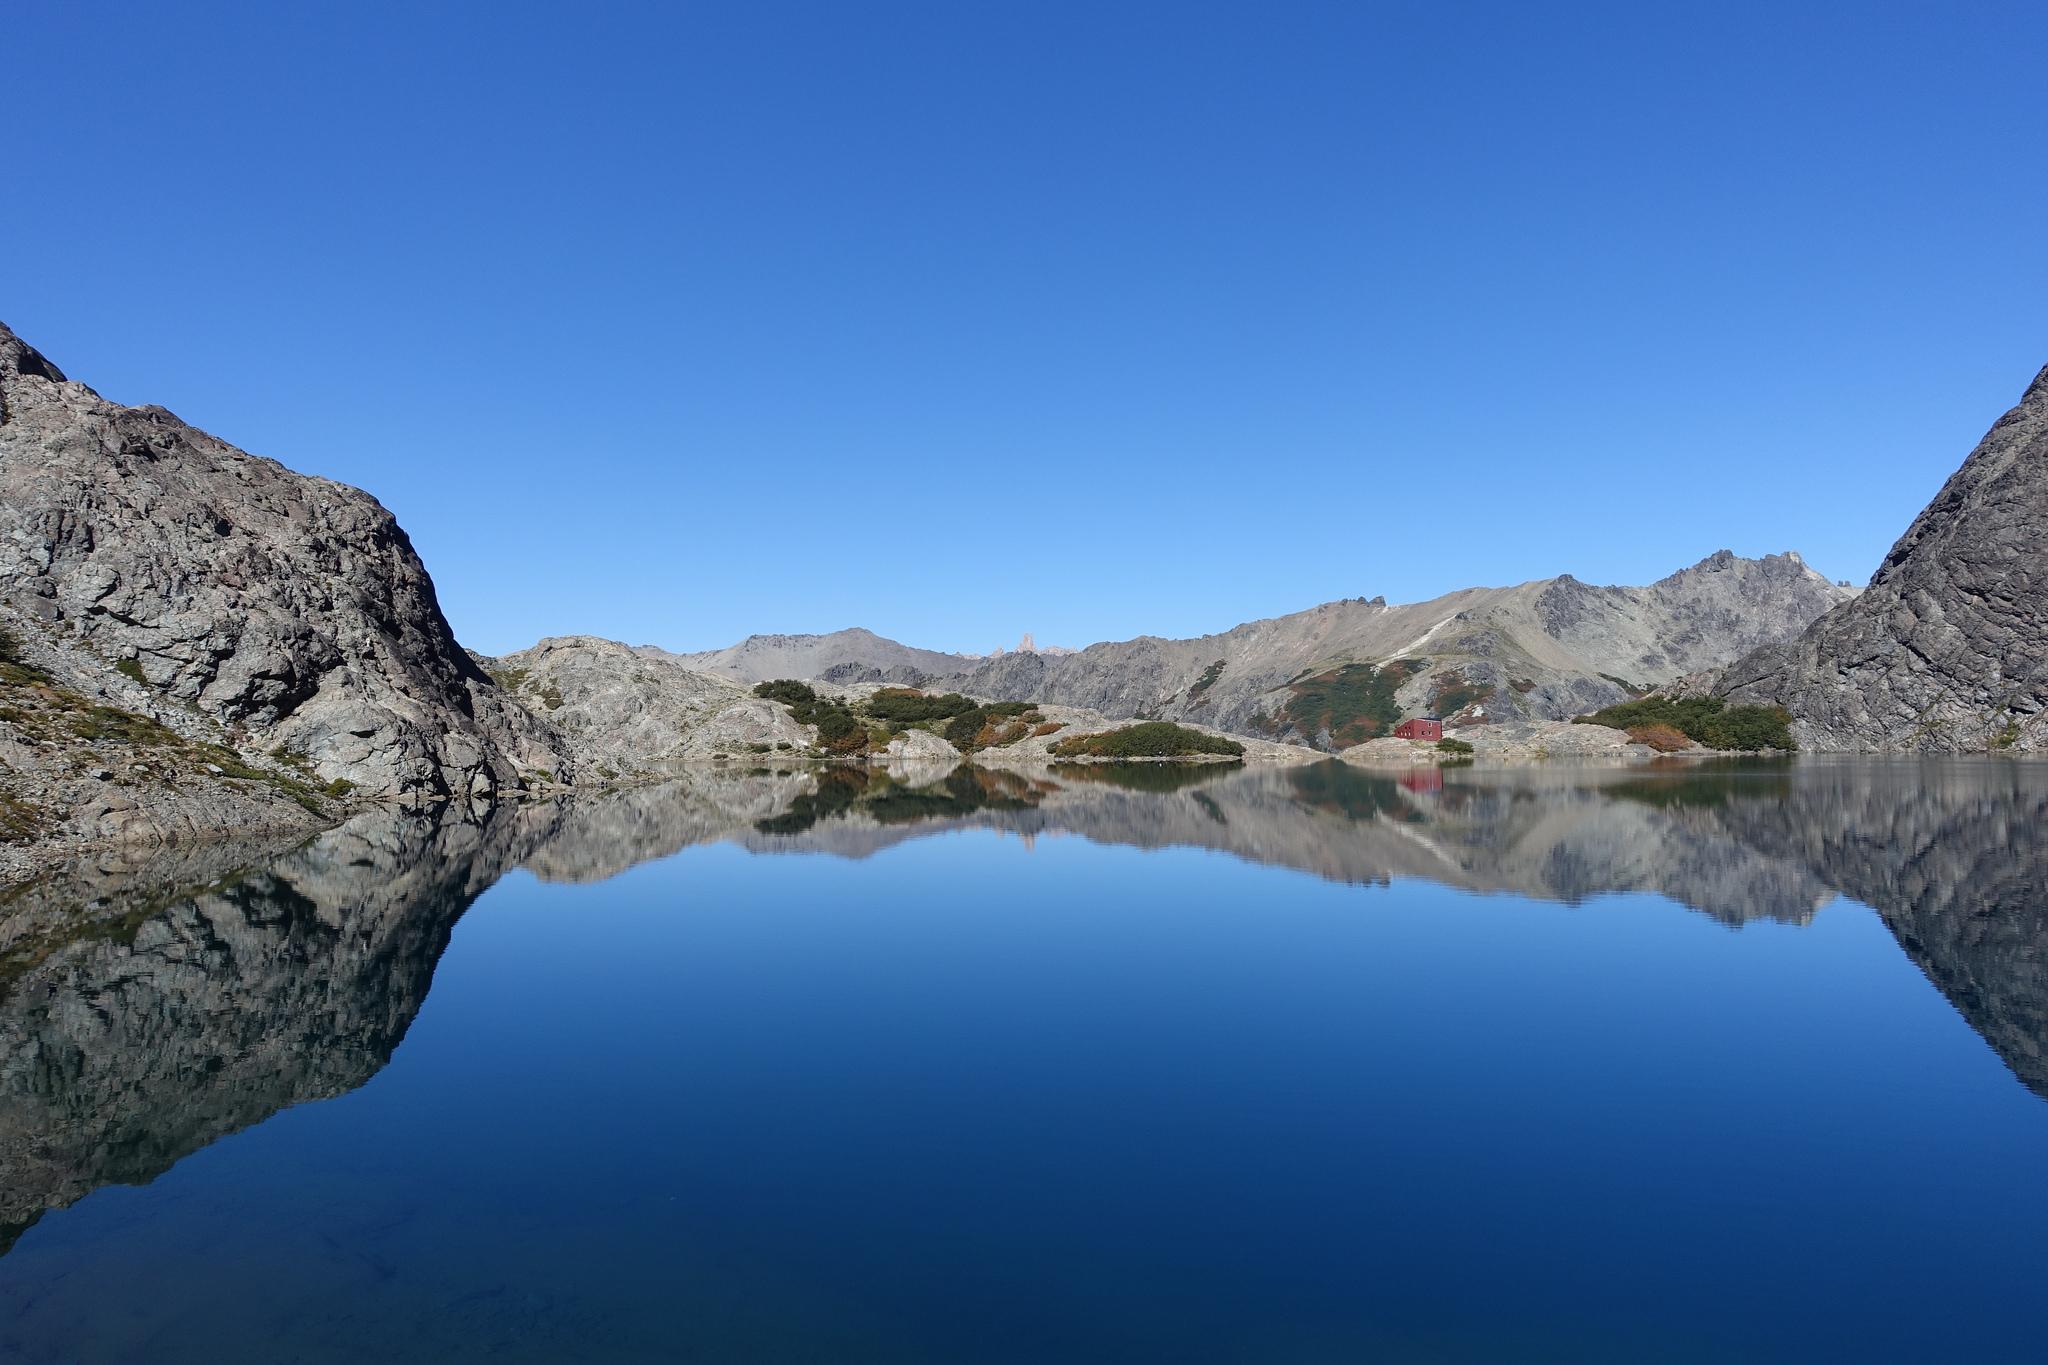 Laguna Negra, Refugio, and Cerro Catedral sticking up in the back